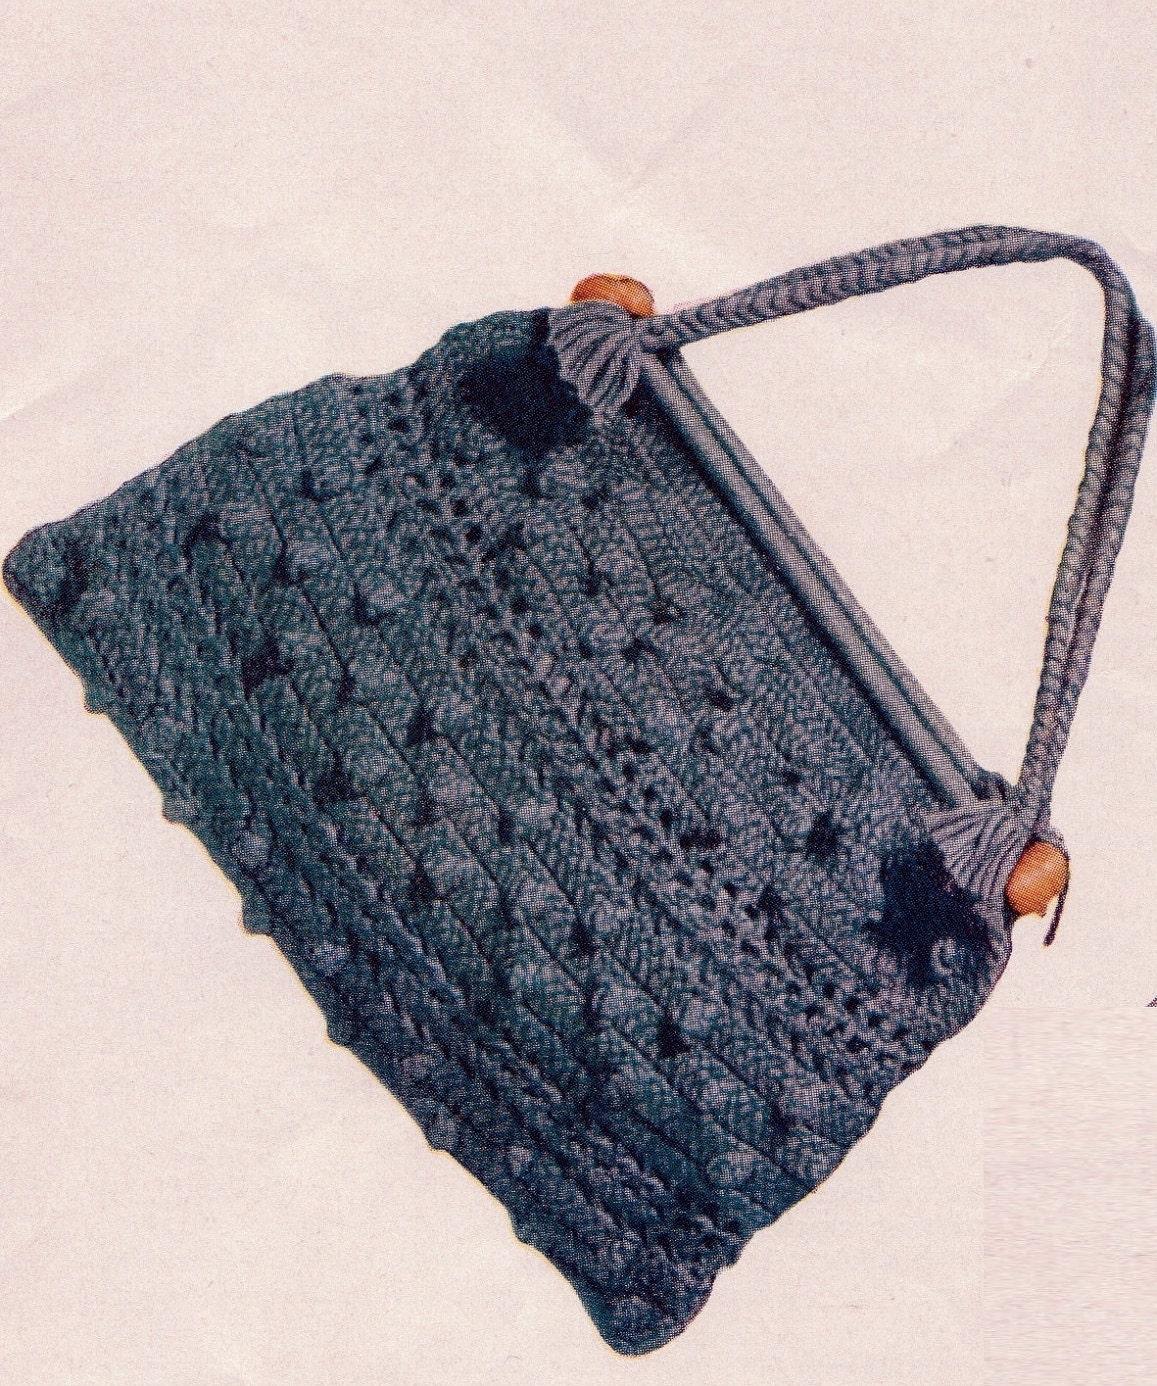 Knitting Bag Patterns Free : Crochet green knitting bag purse s vintage crocheting